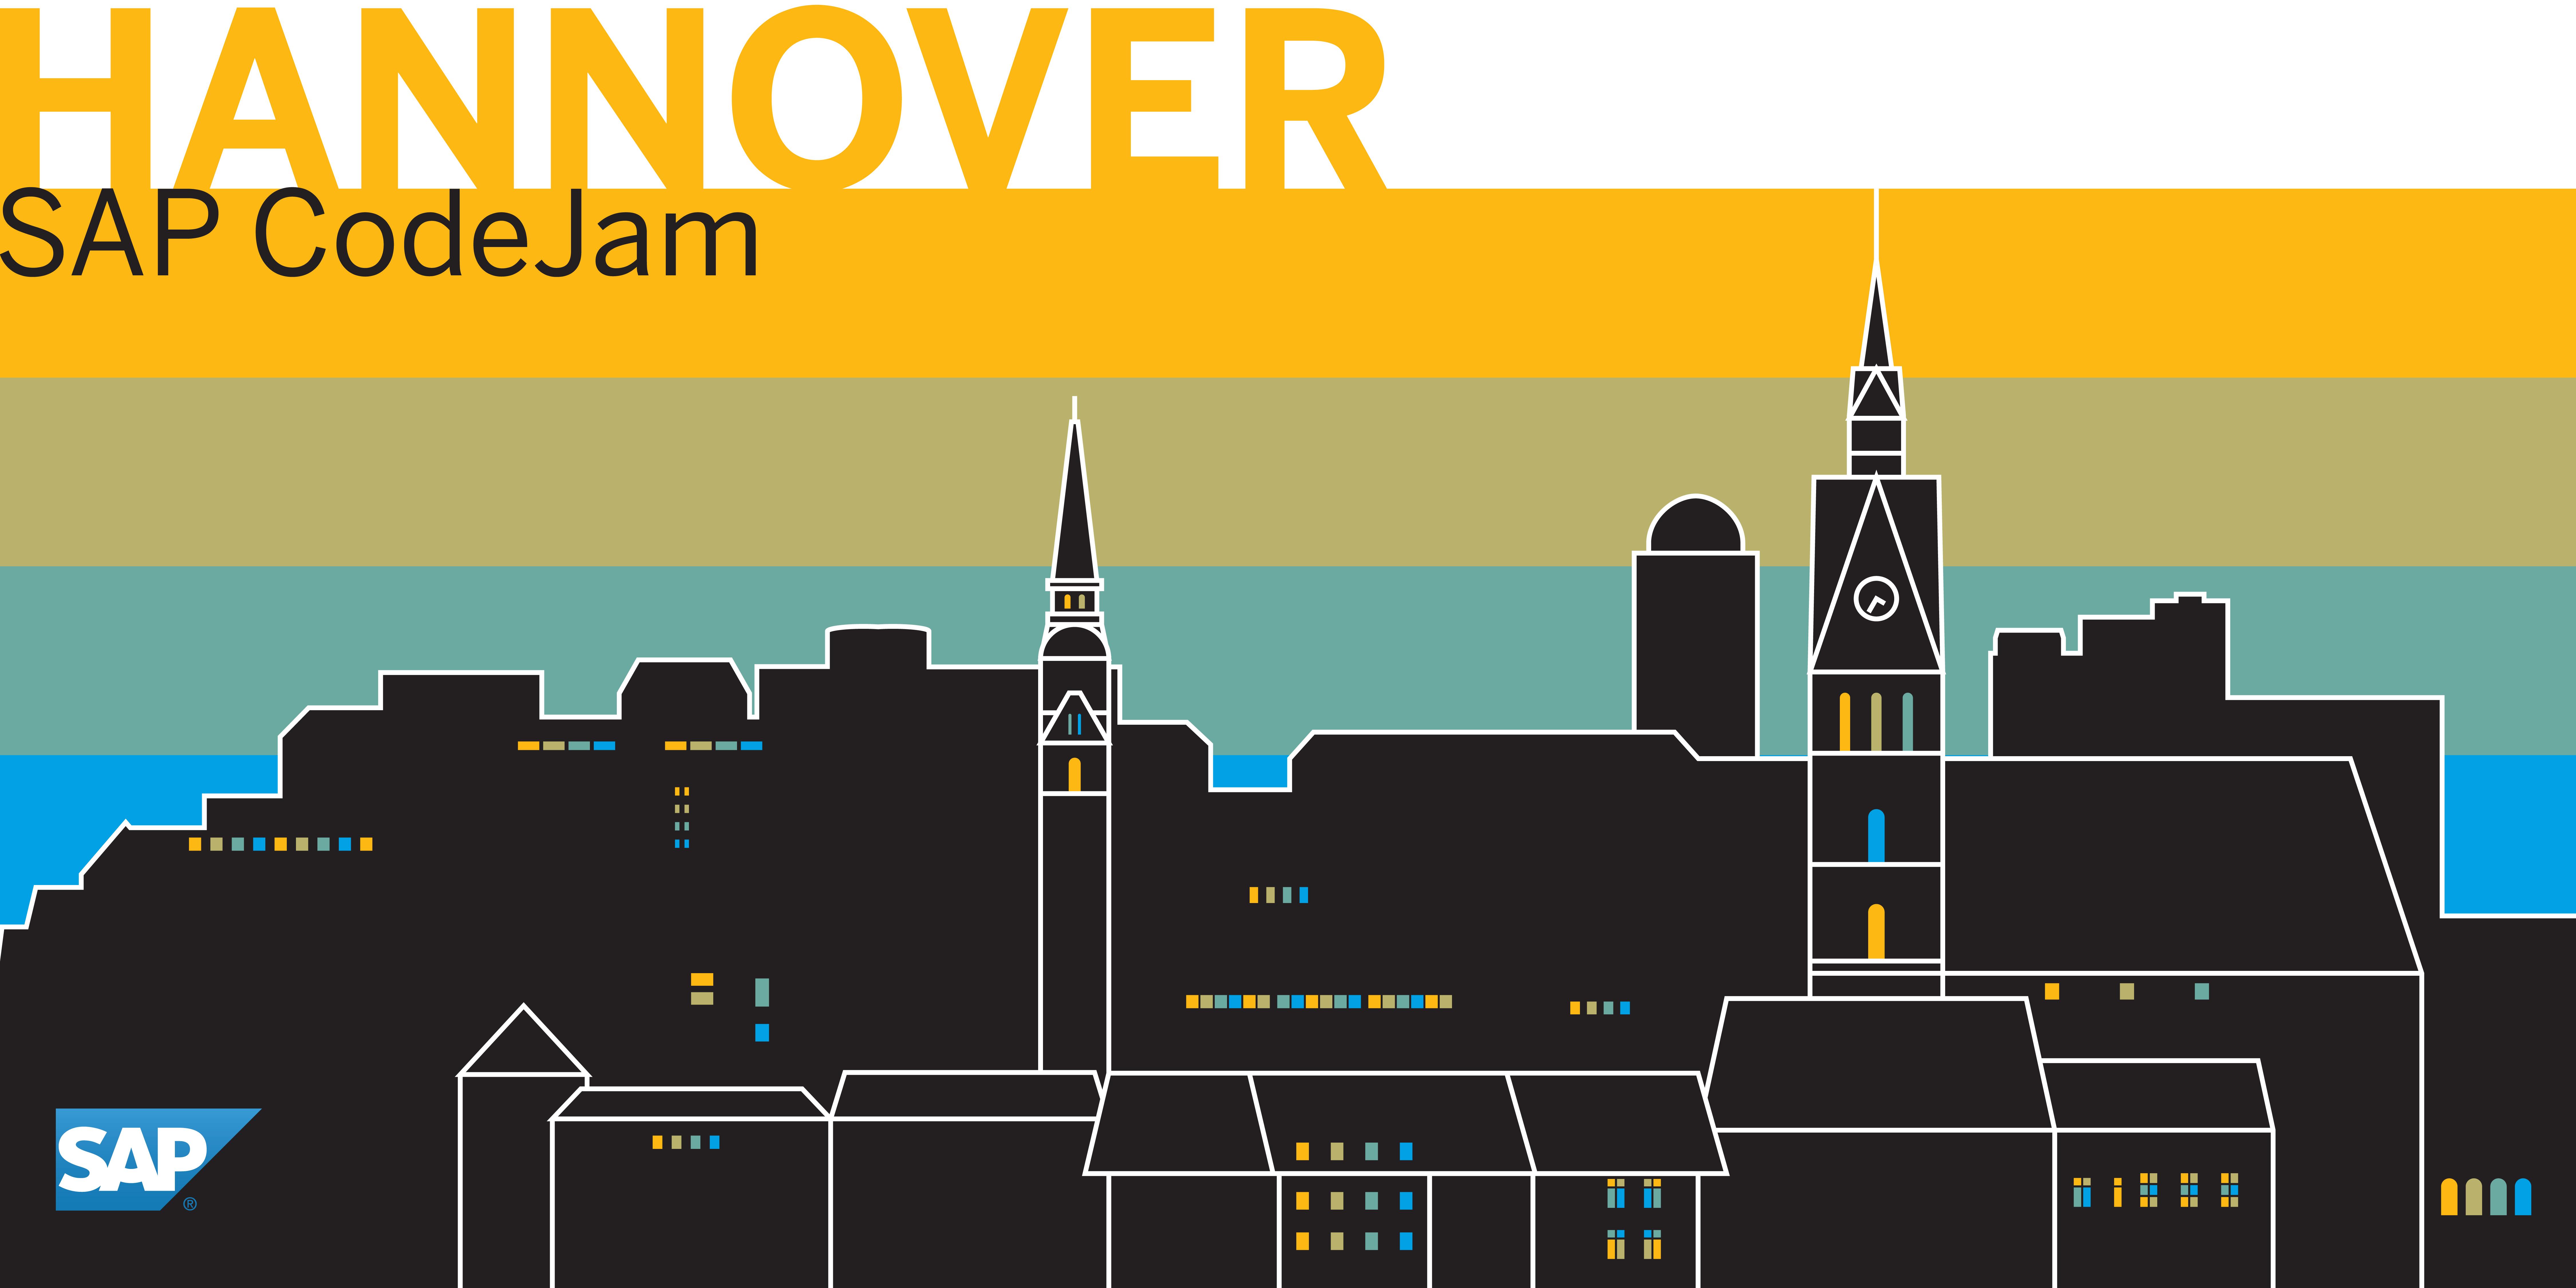 SAP CodeJam Hannover